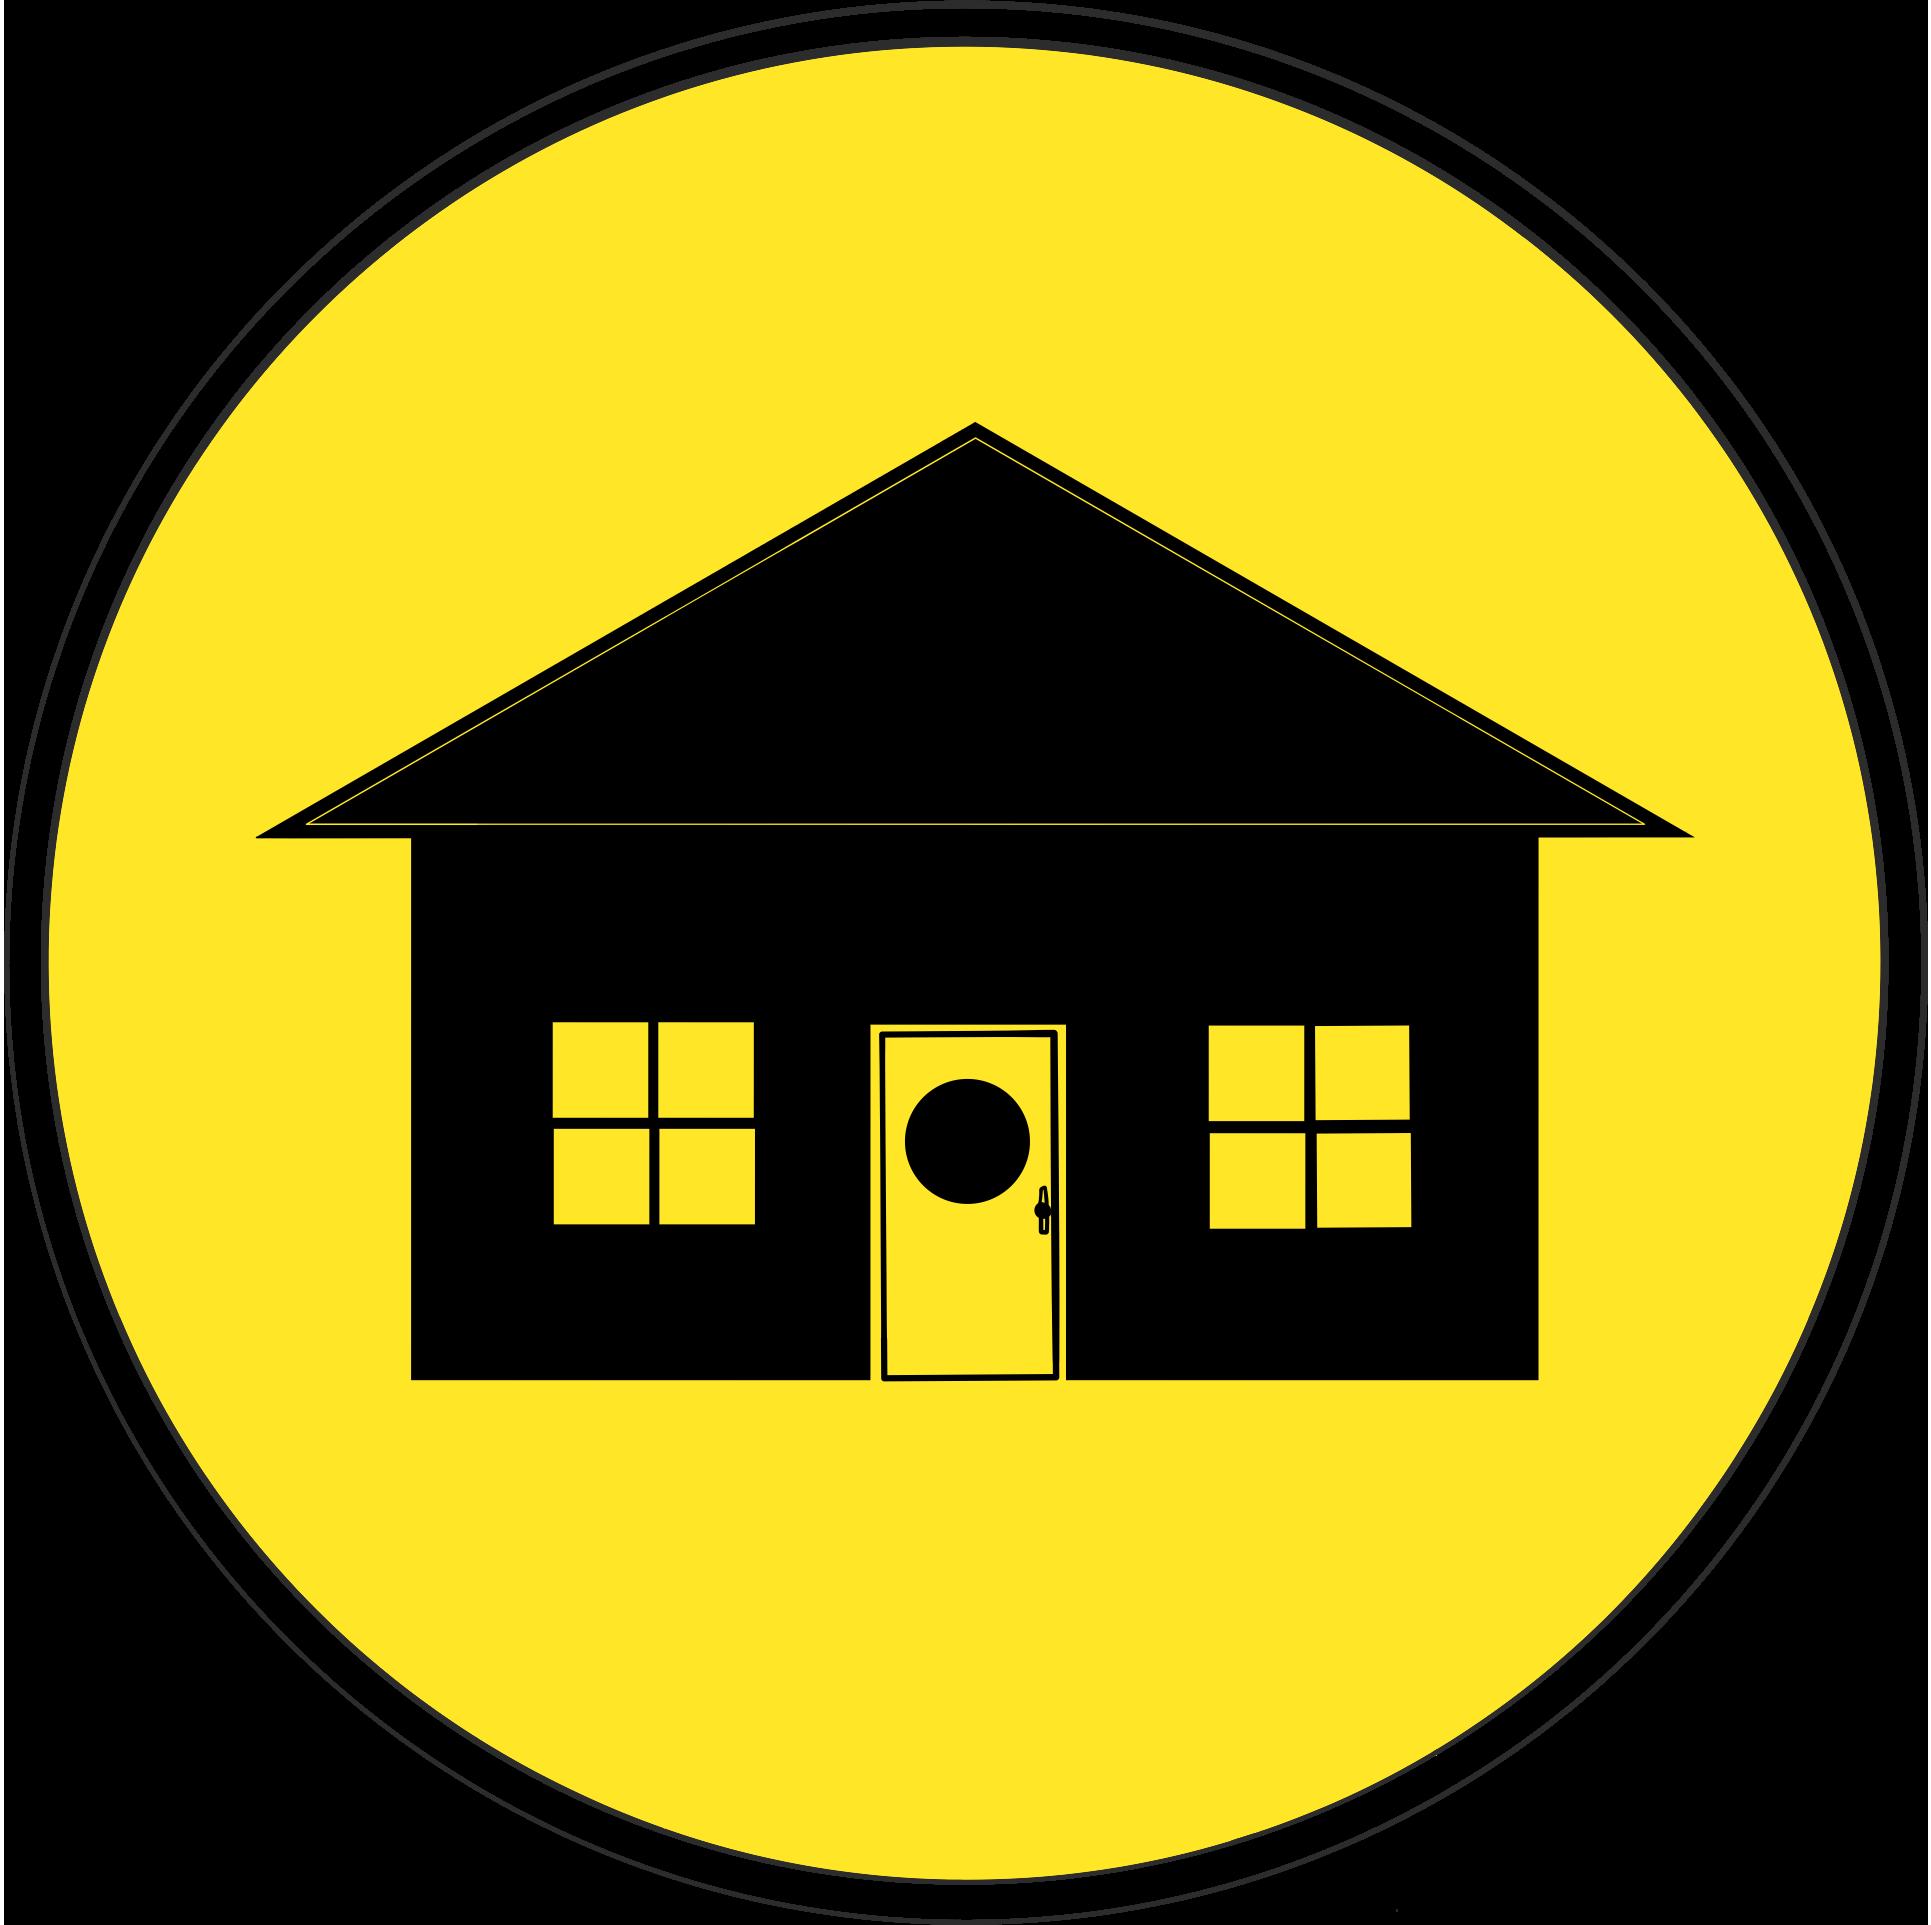 office-yellow-circle.png